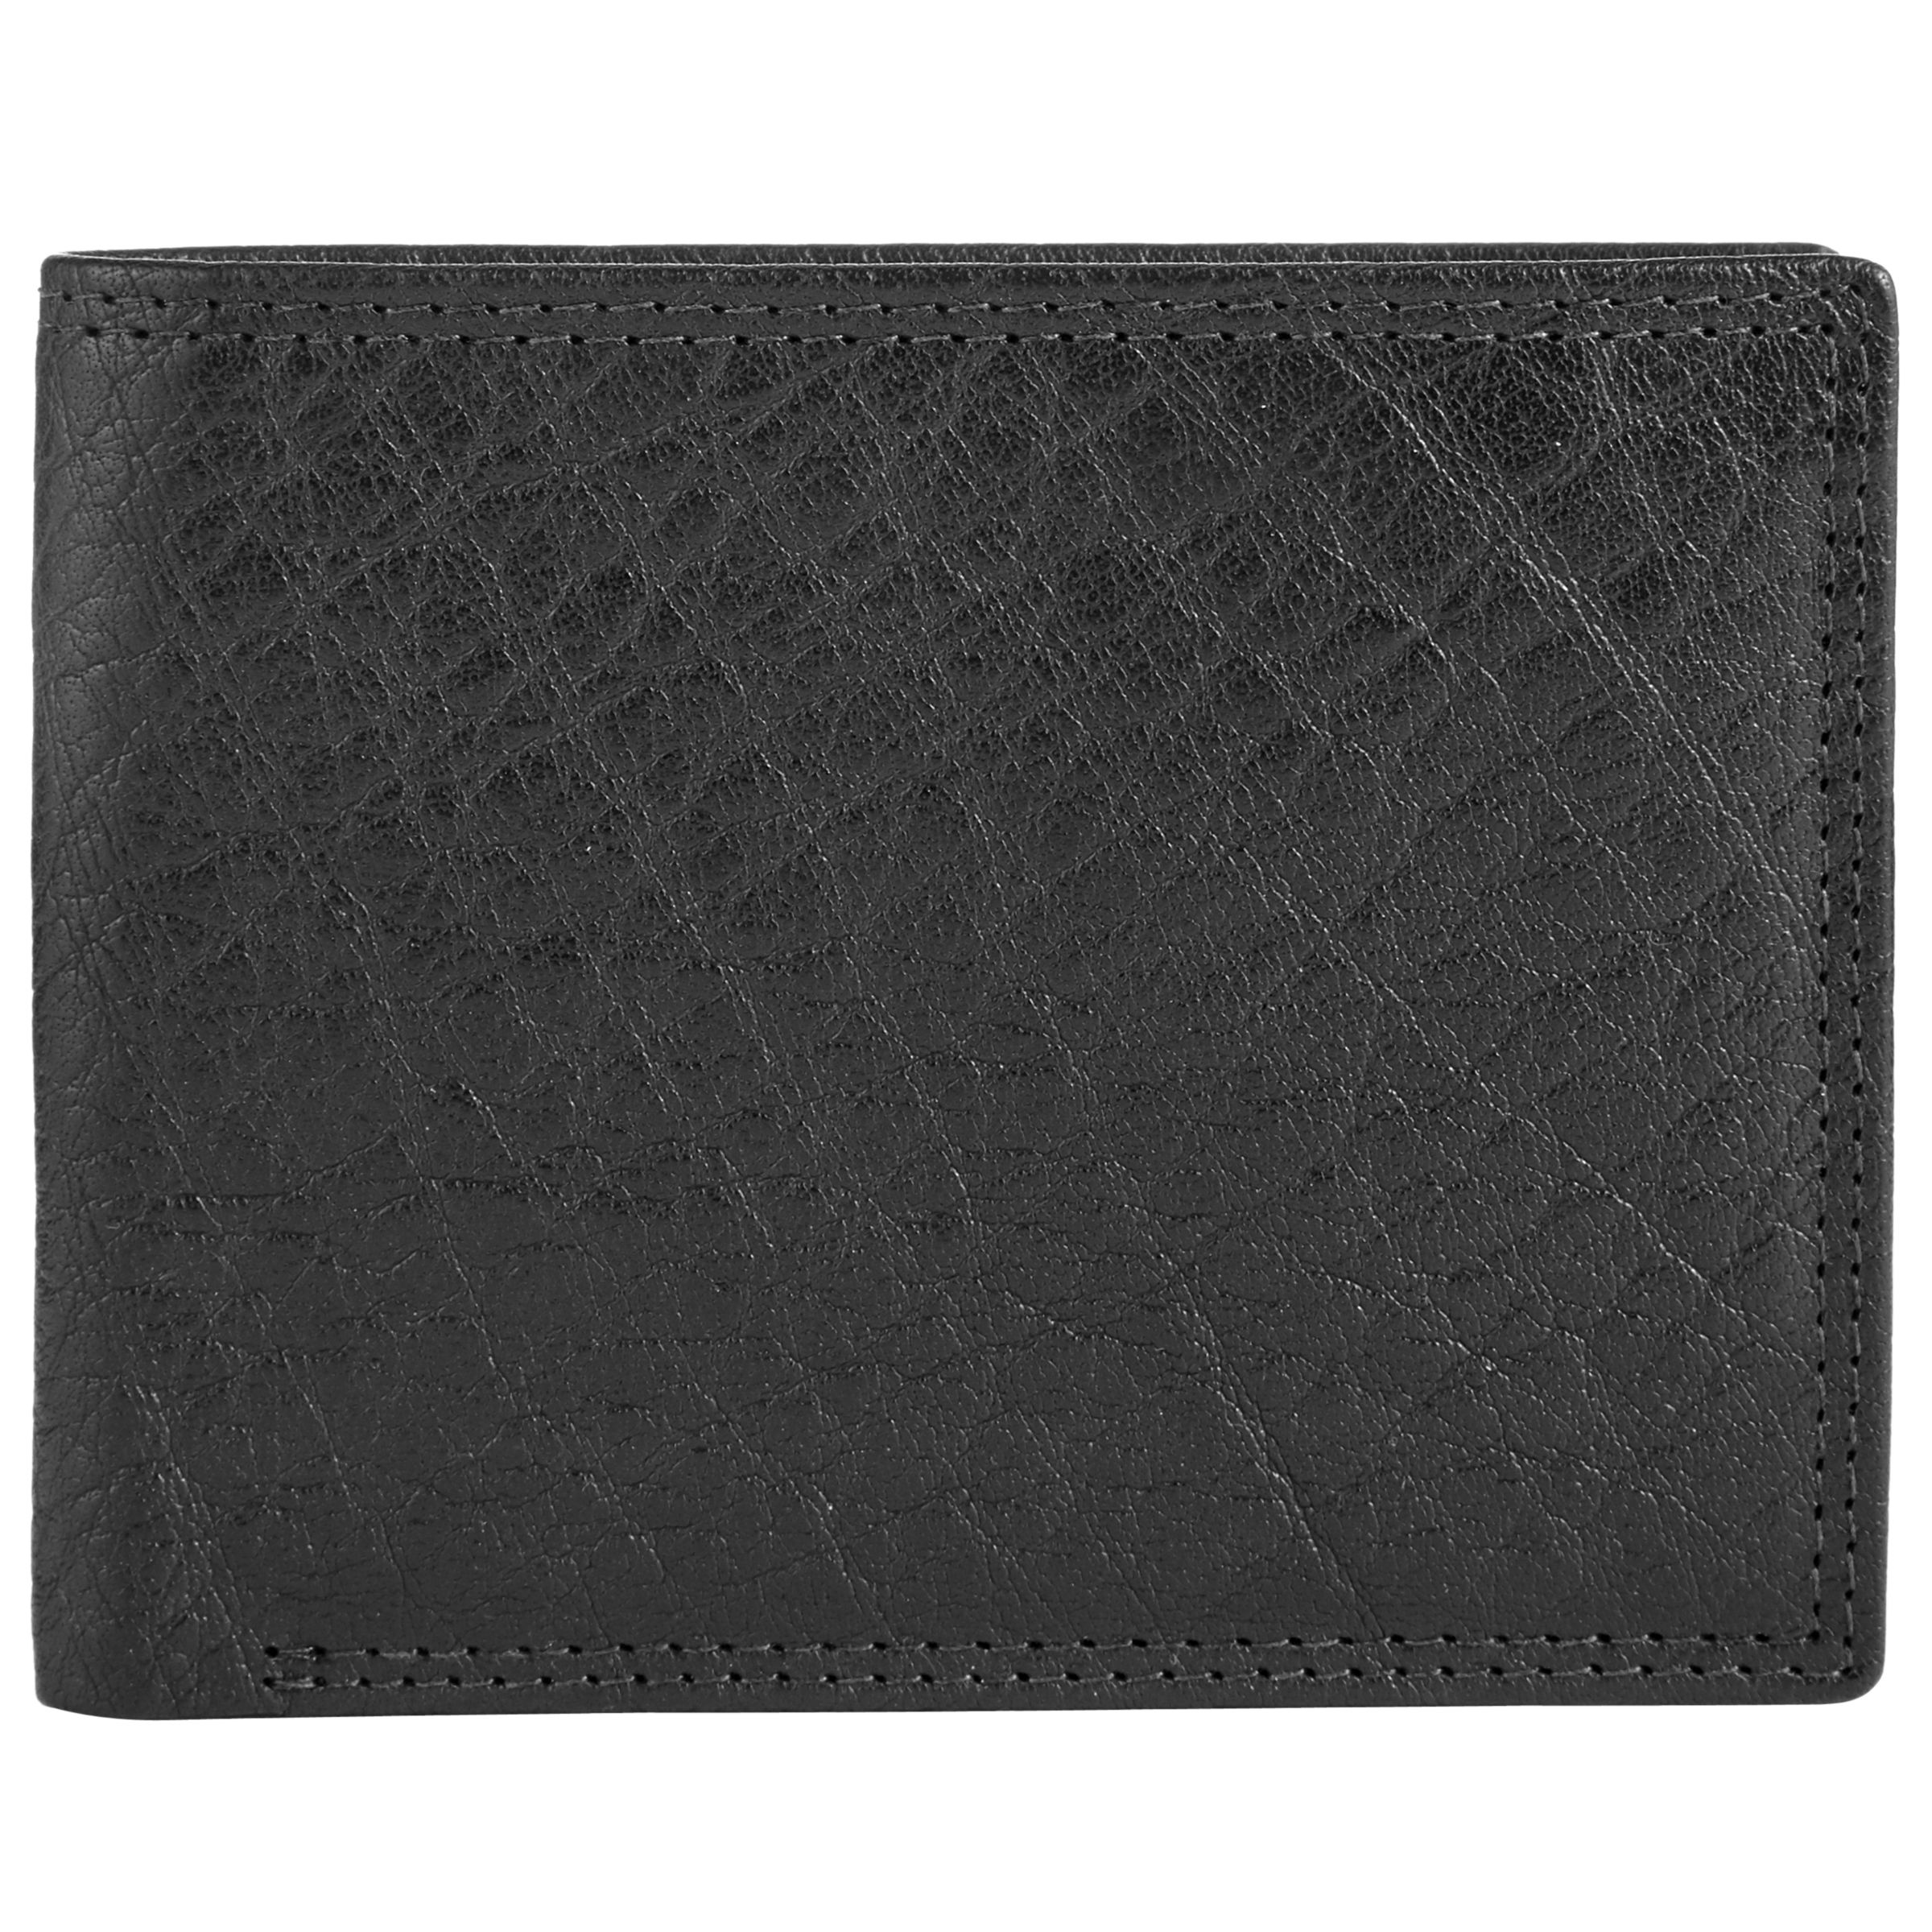 ee1ccd680643 John Lewis Bifold Katta Aniline Leather RFID Blocking Wallet, Black